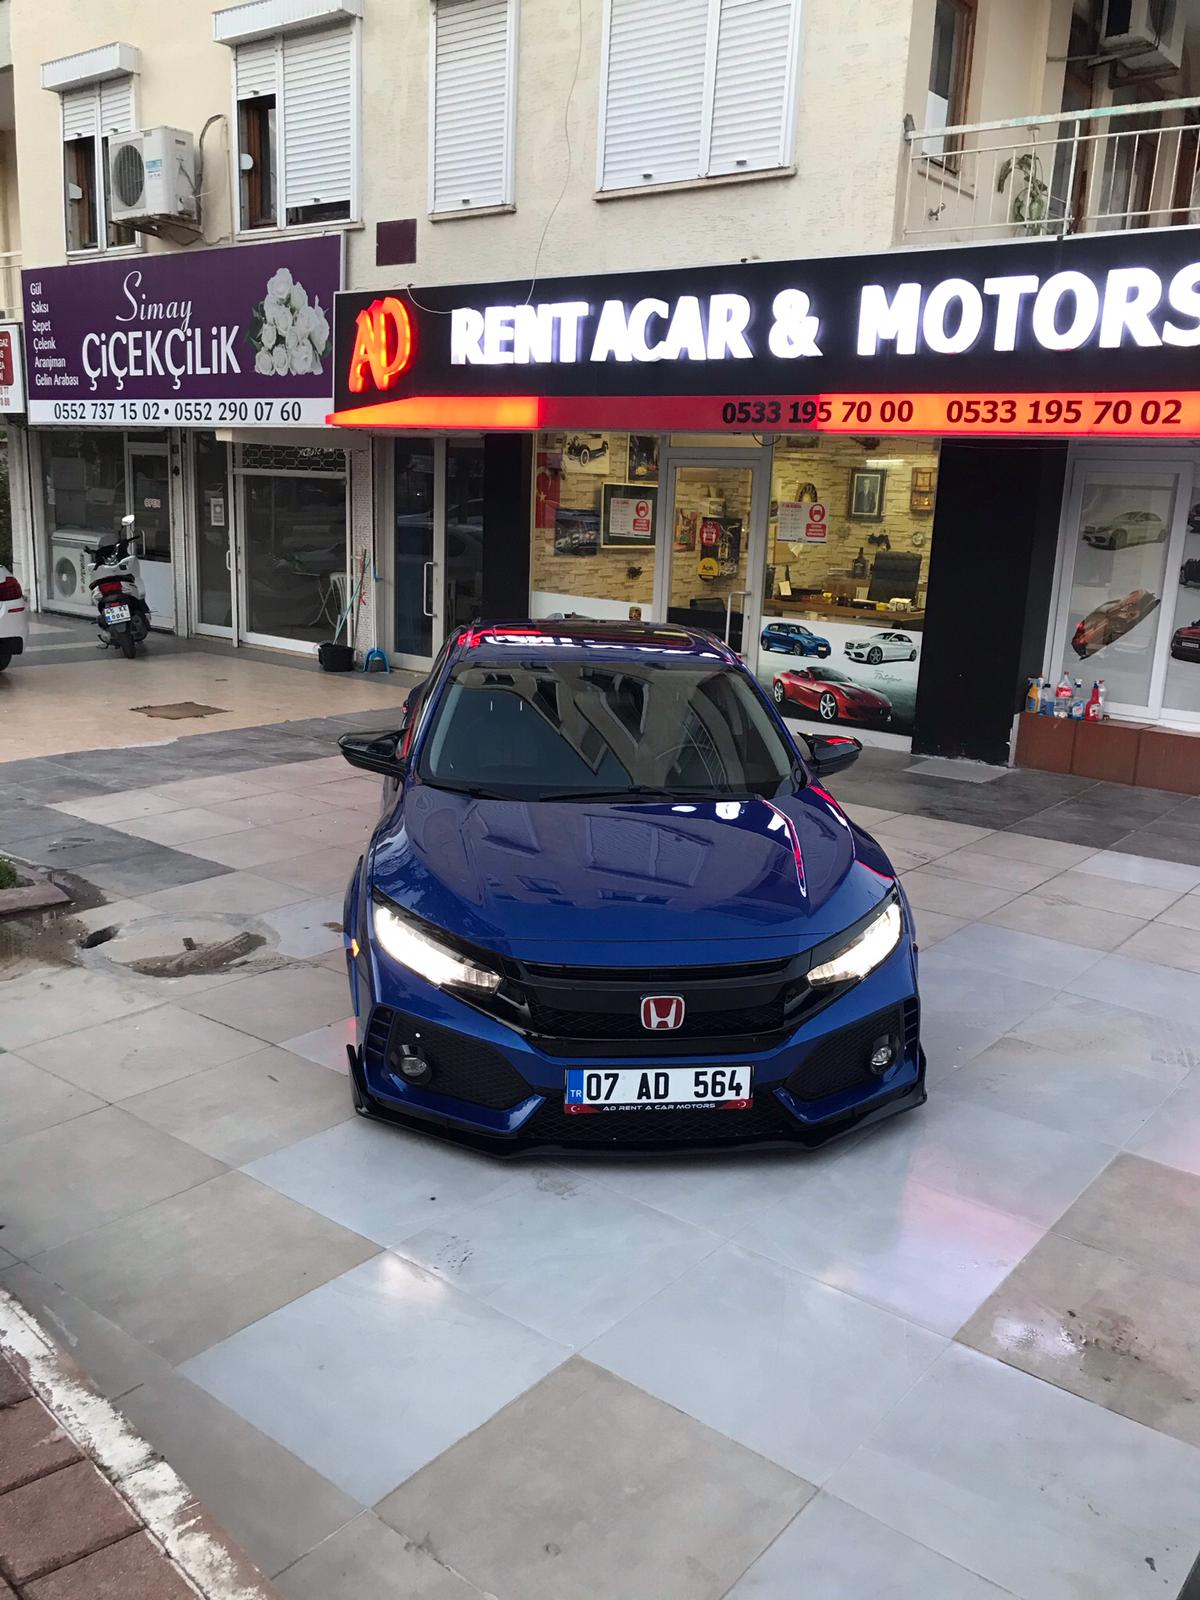 Honda Civic zu vermieten in Antalya